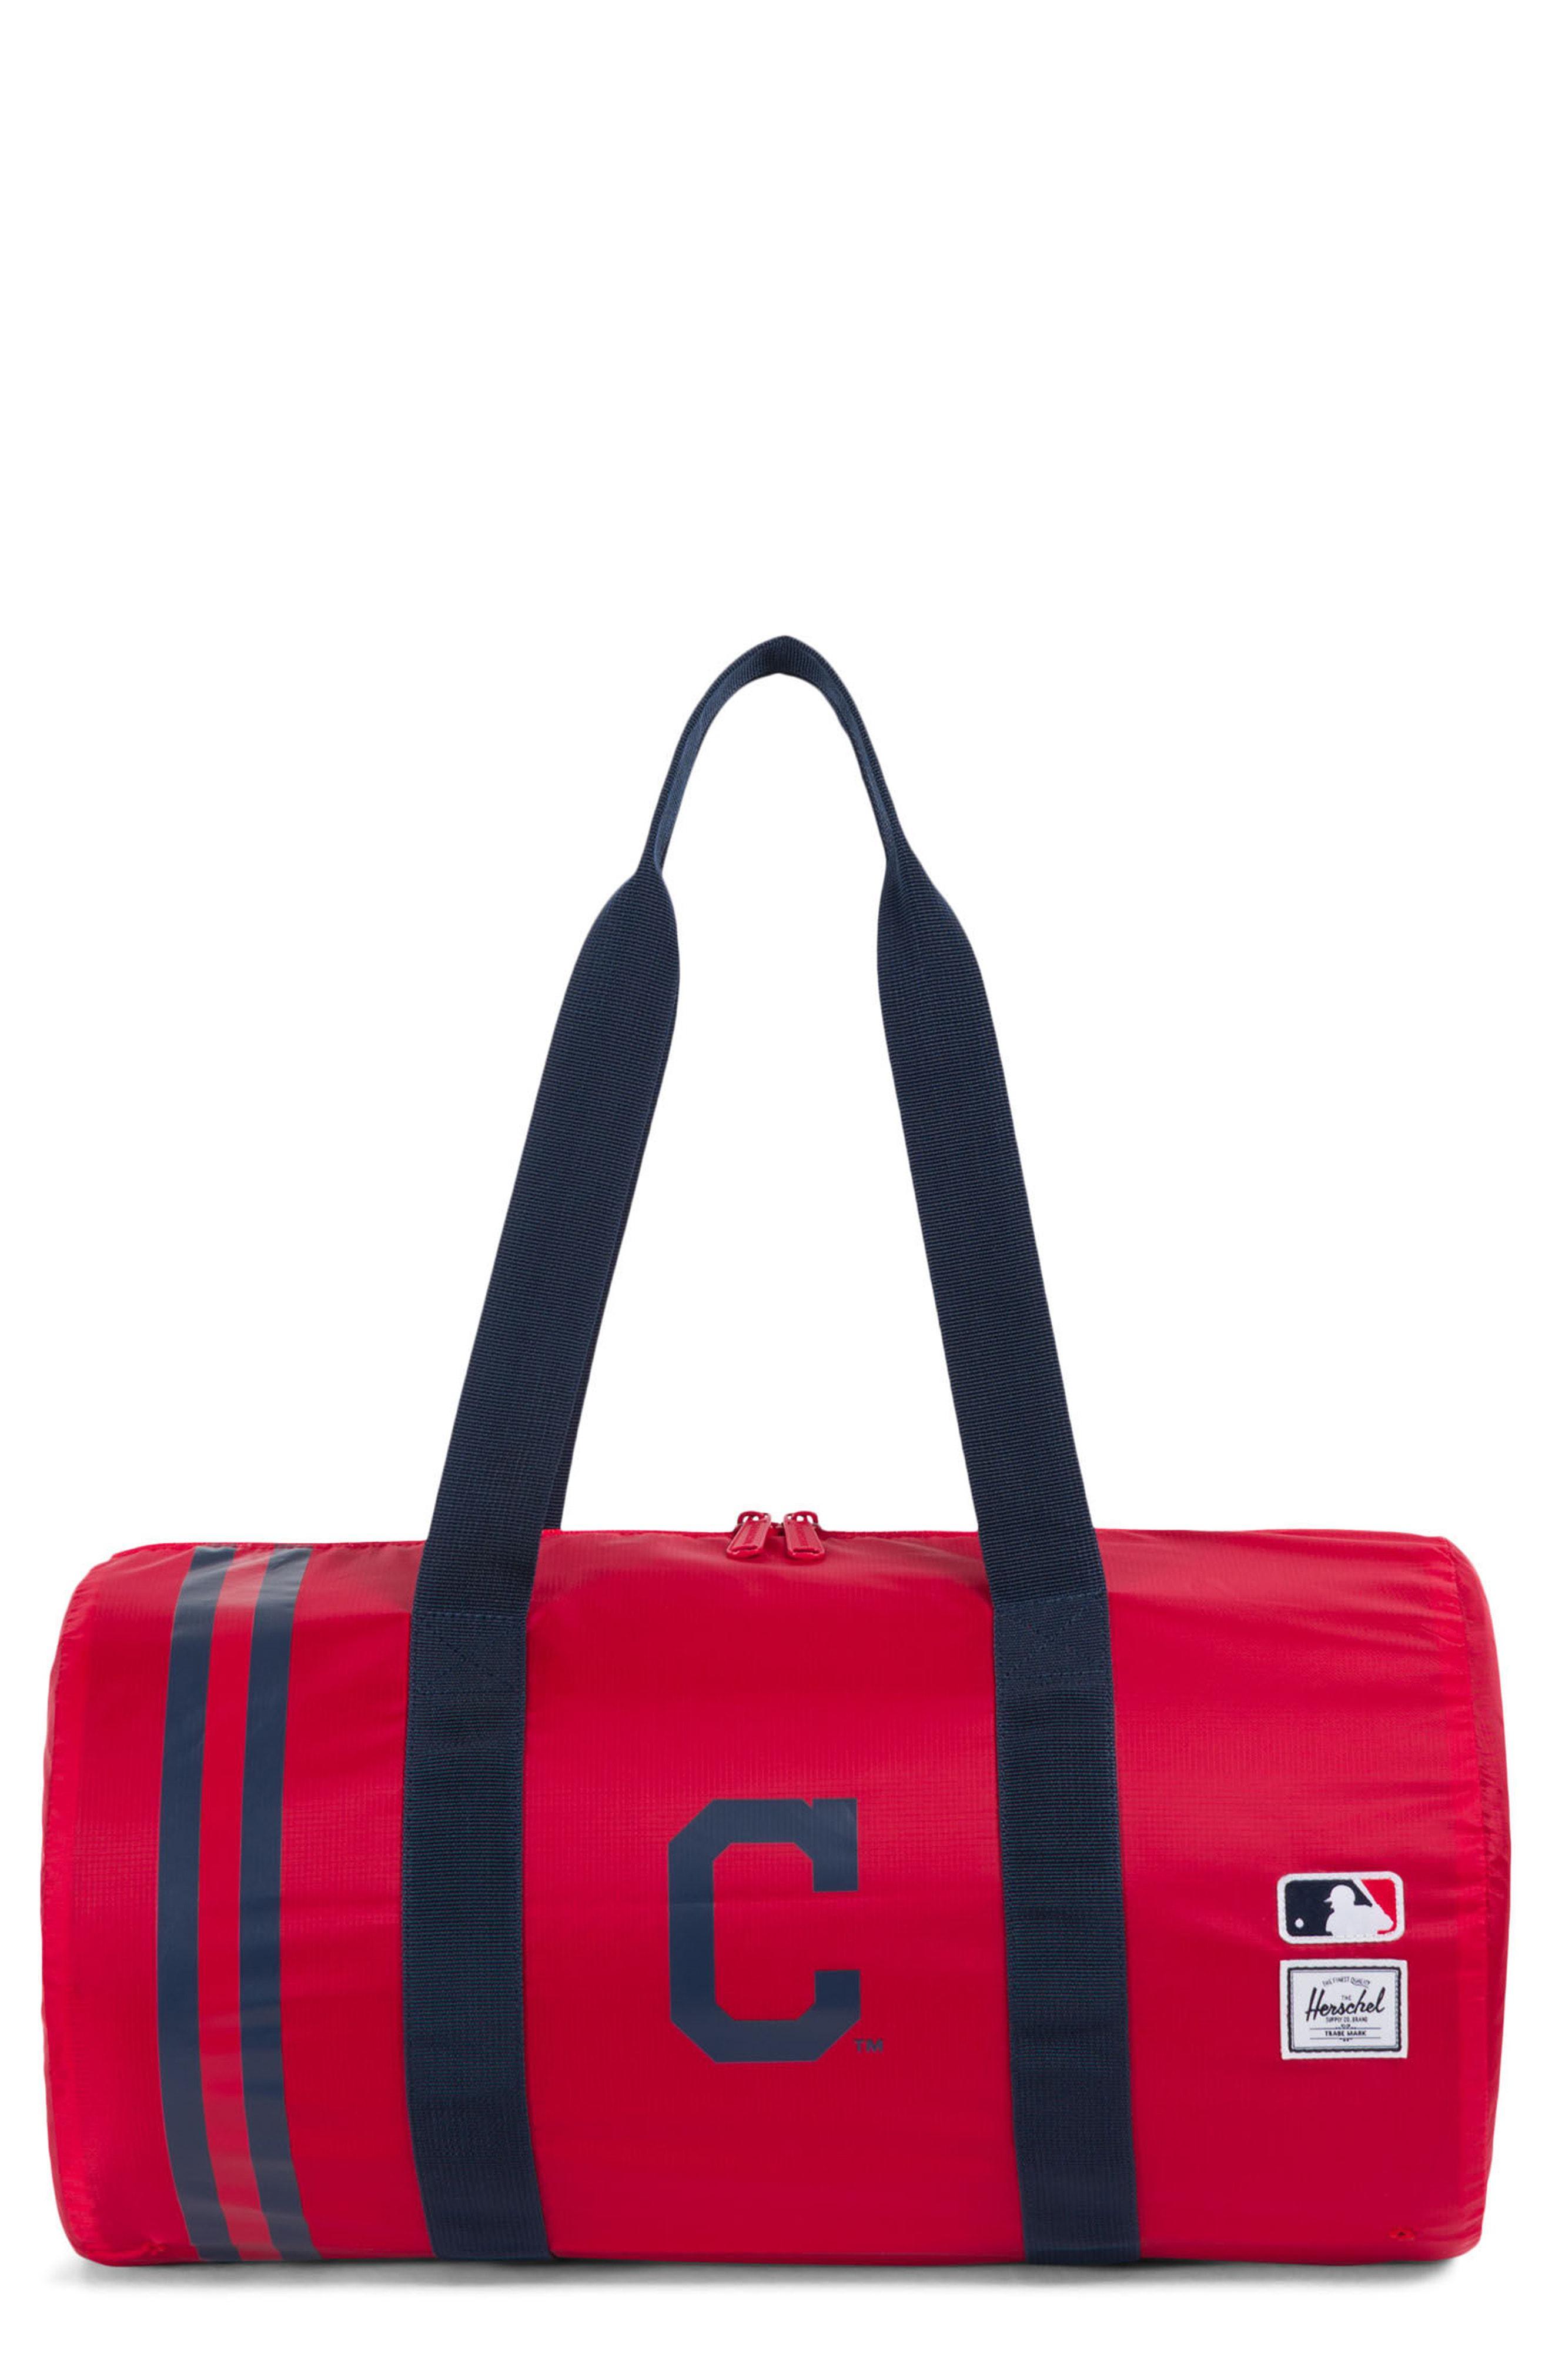 Lyst - Herschel Supply Co. Packable - Mlb American League Duffel Bag ... e5fc18ec6ad79